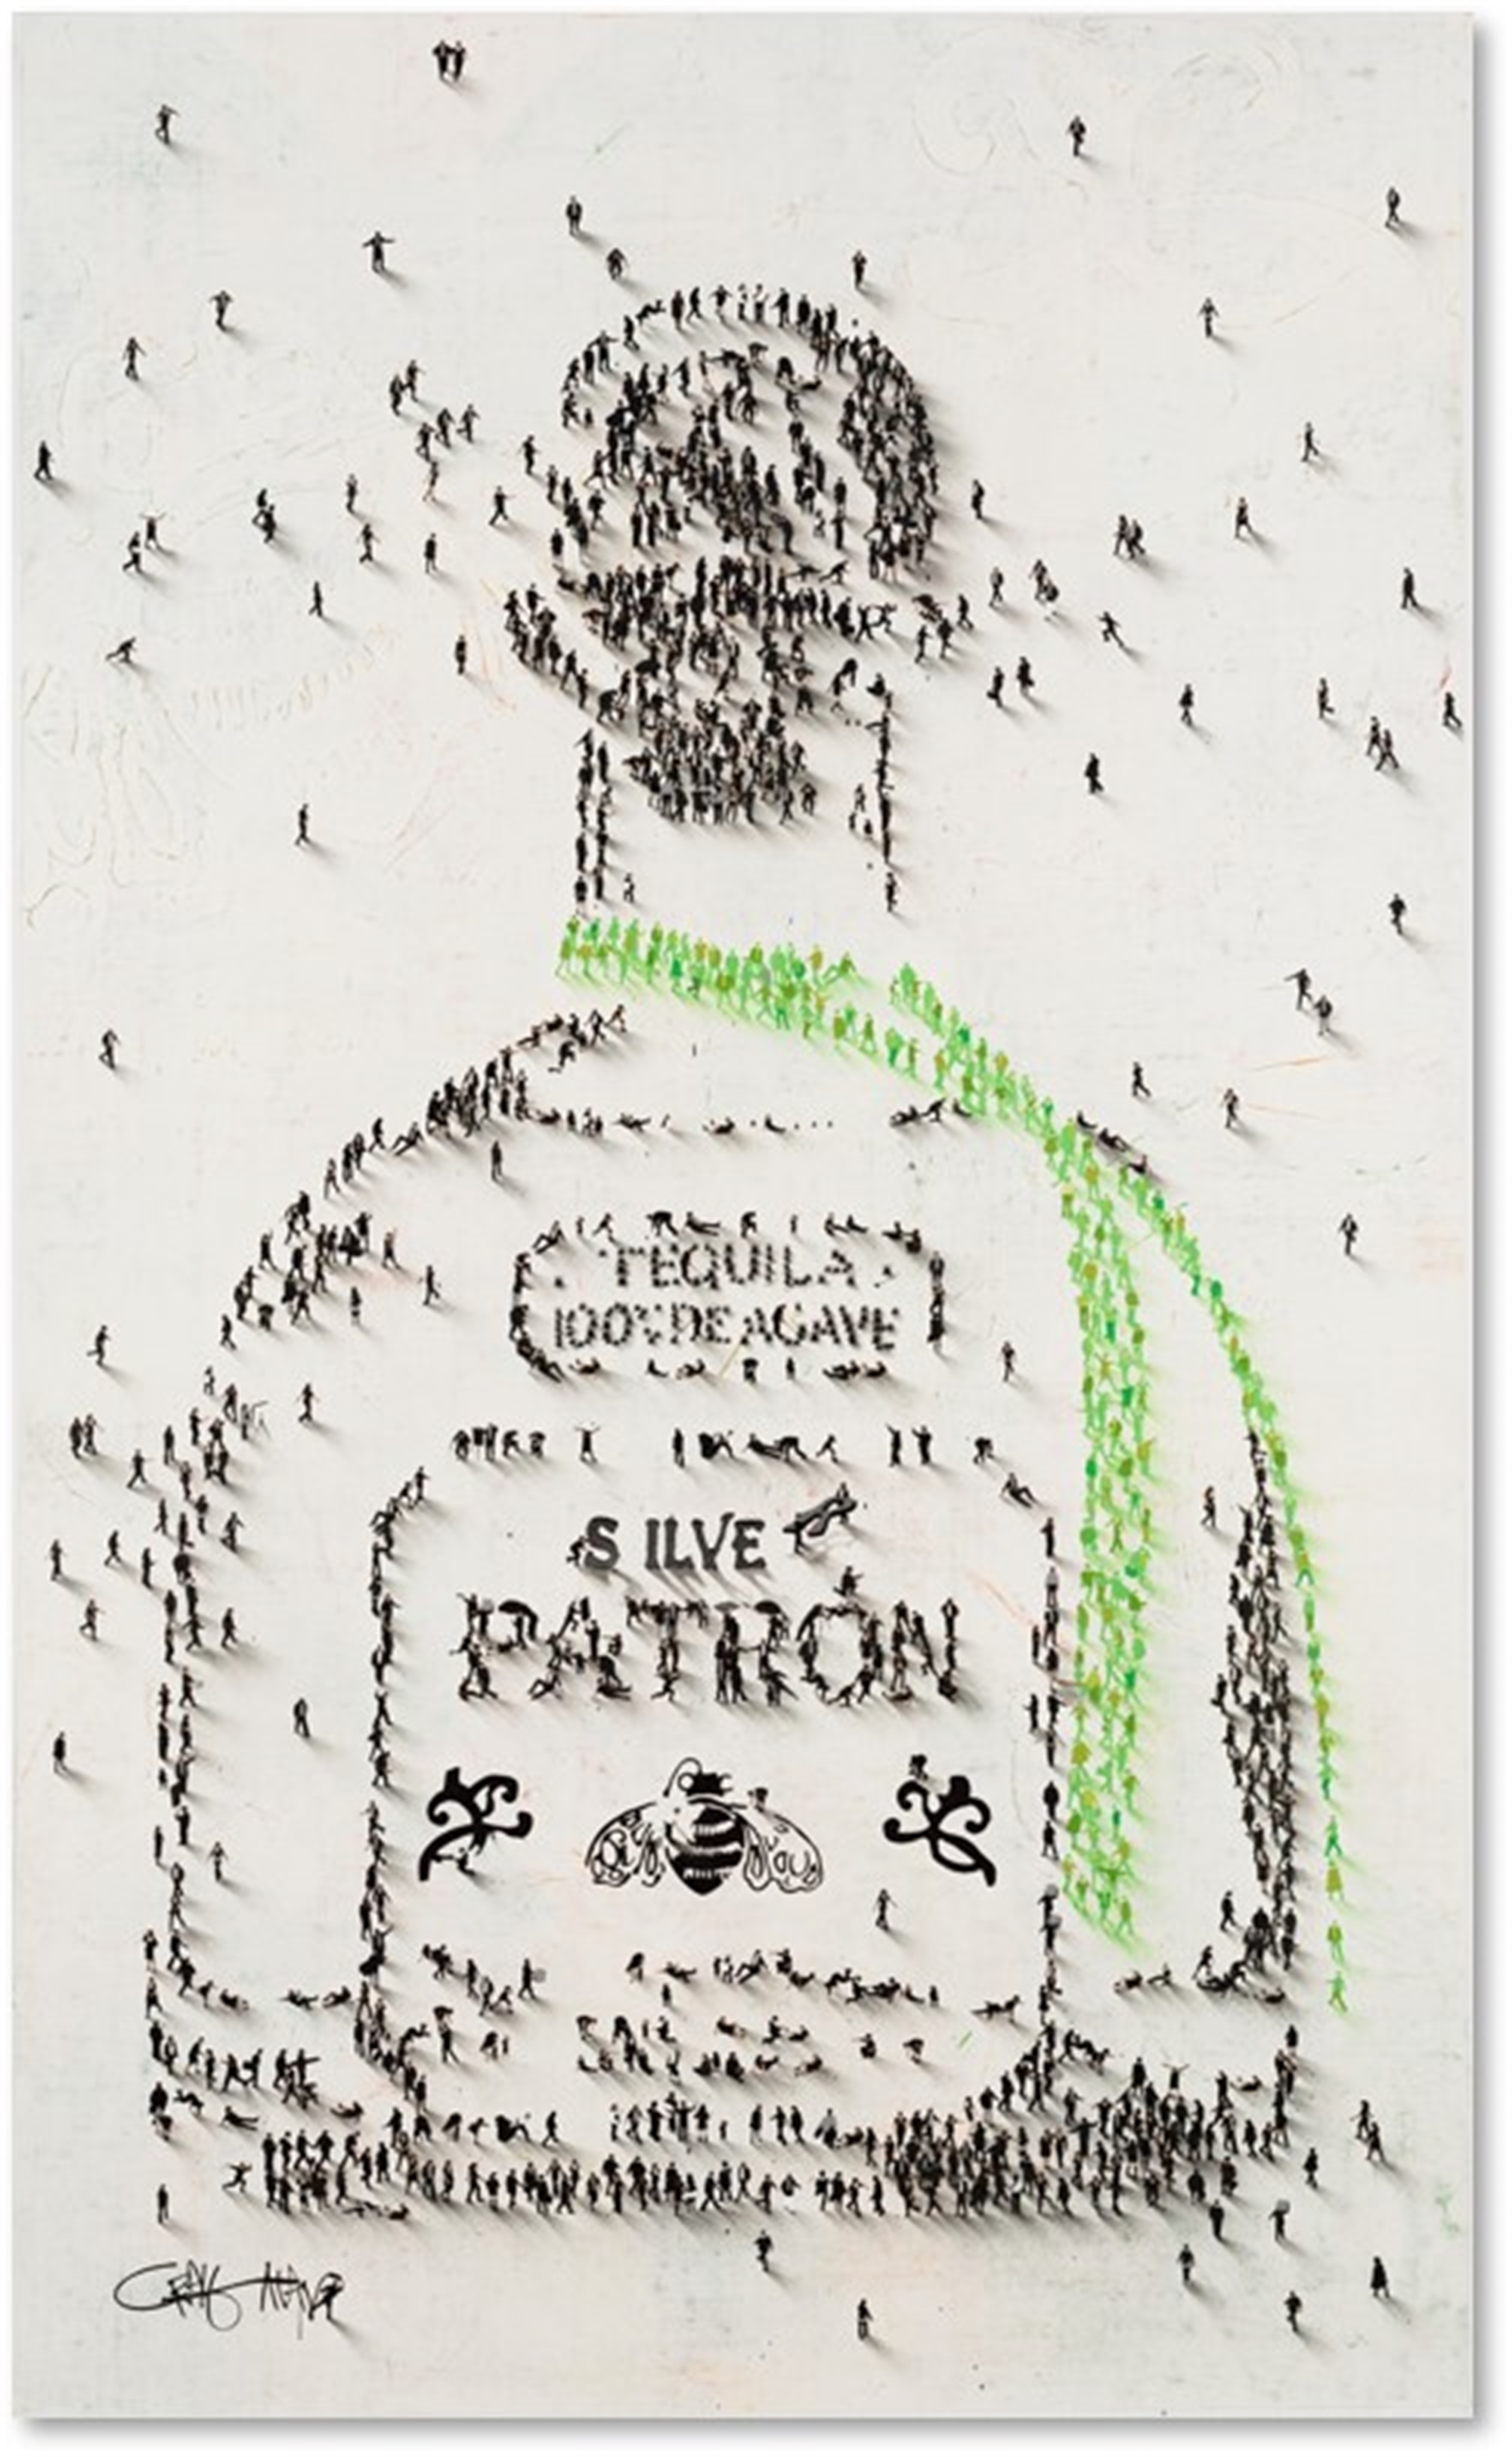 Patron (SOLD) by Populus Commission Craig Alan